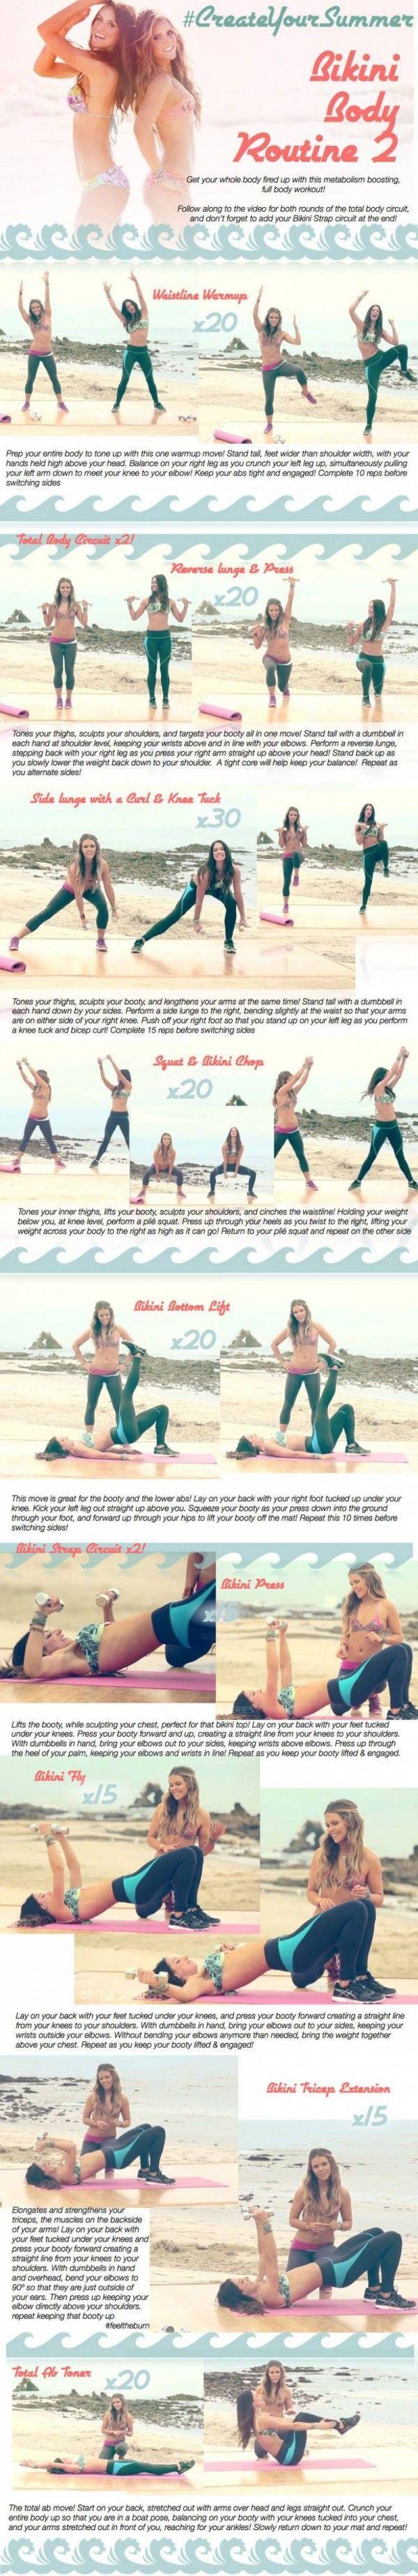 Bikini body workout routine pinterest at home workouts to get you